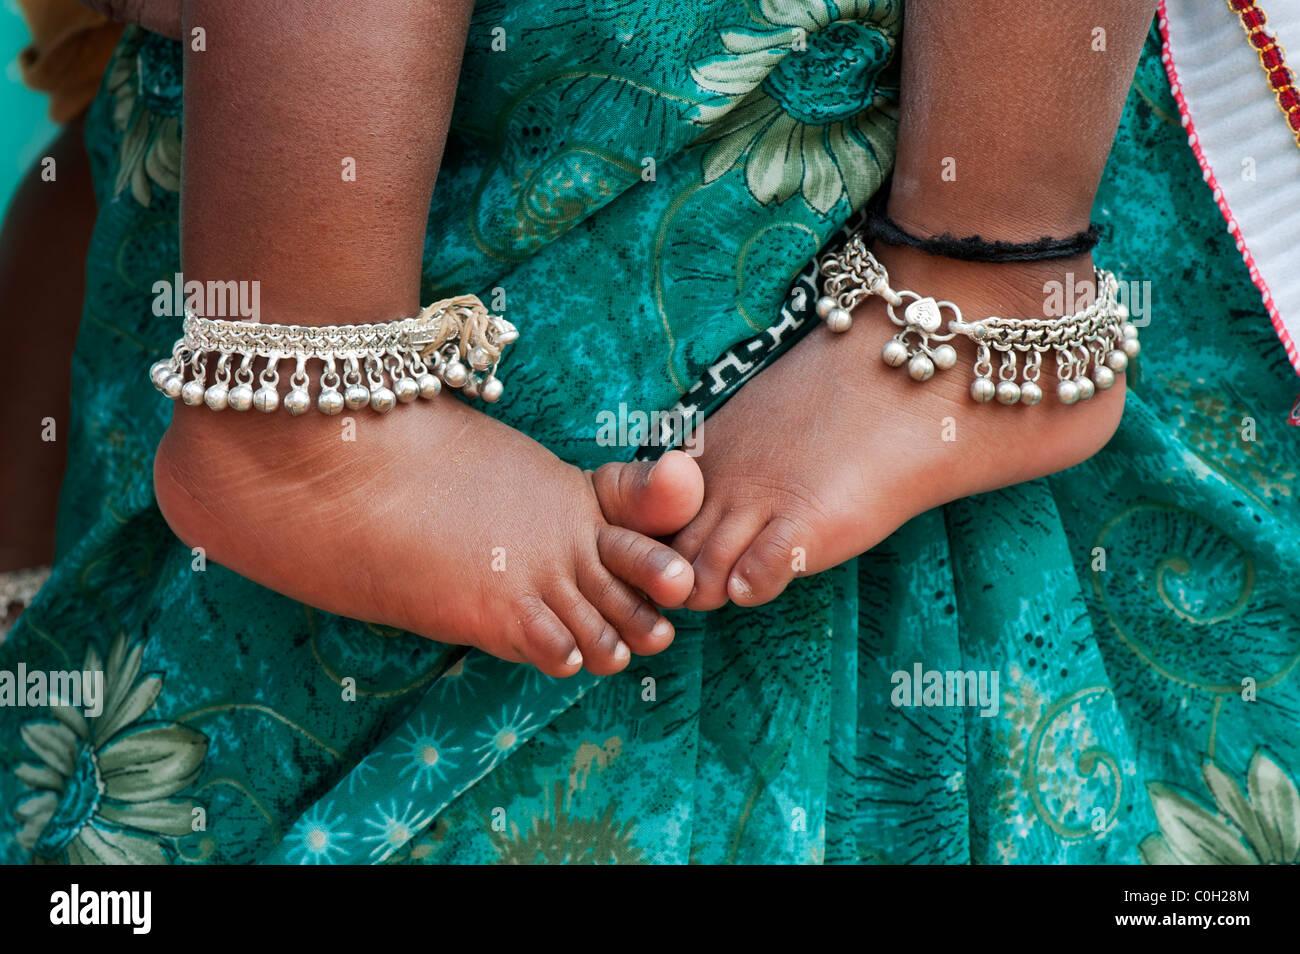 Les bébés indiens pieds nus contre les mères floral vert sari. L'Andhra Pradesh, Inde Banque D'Images